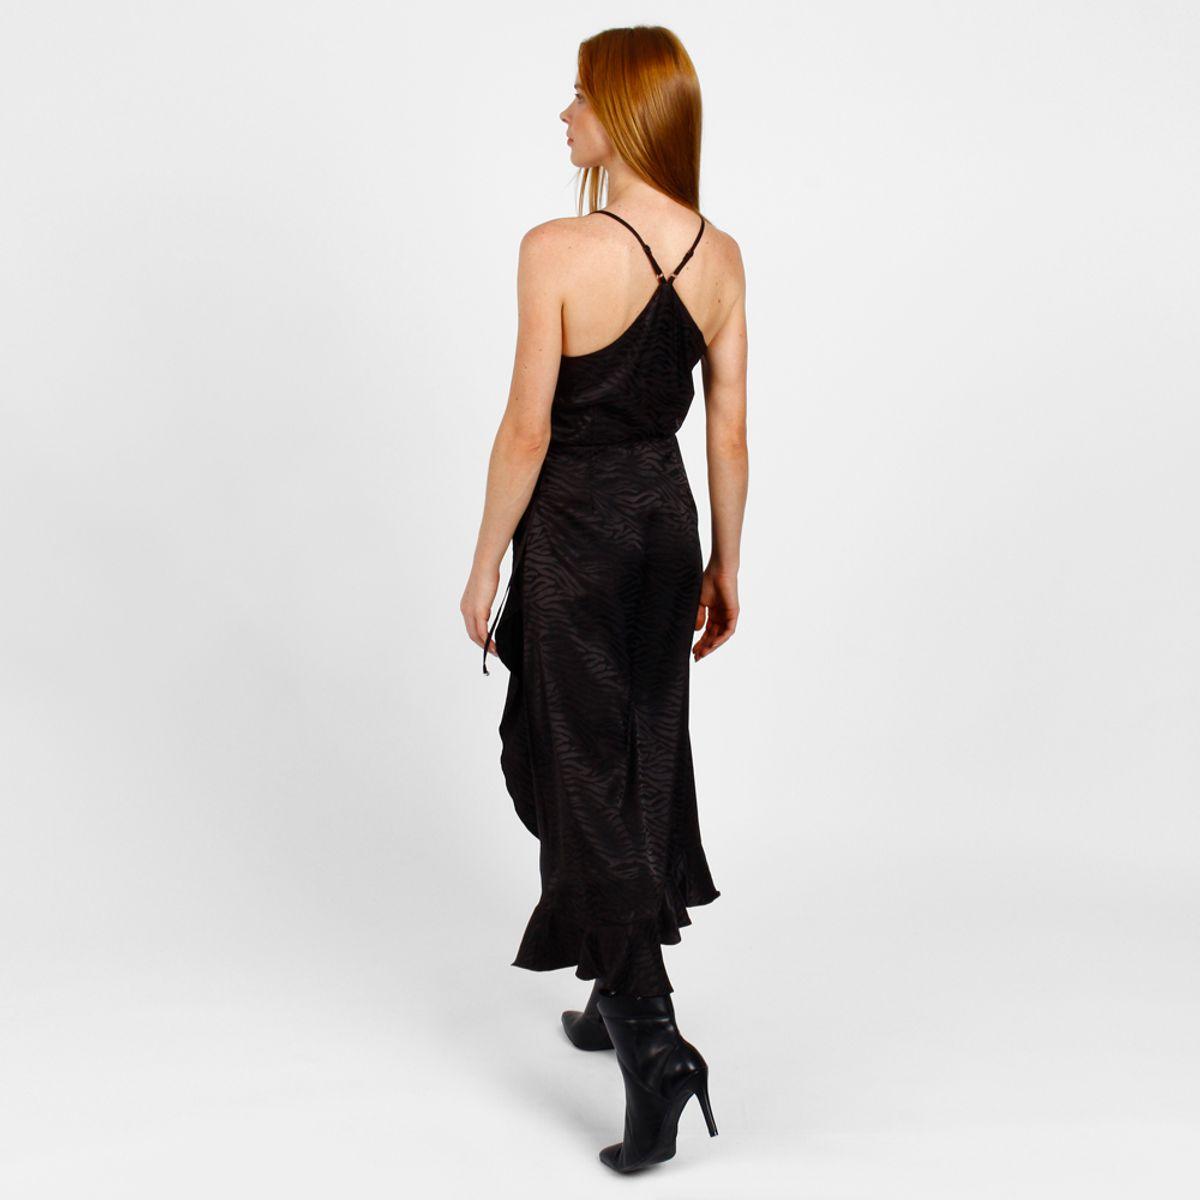 Vestido-Liso-Plano---34